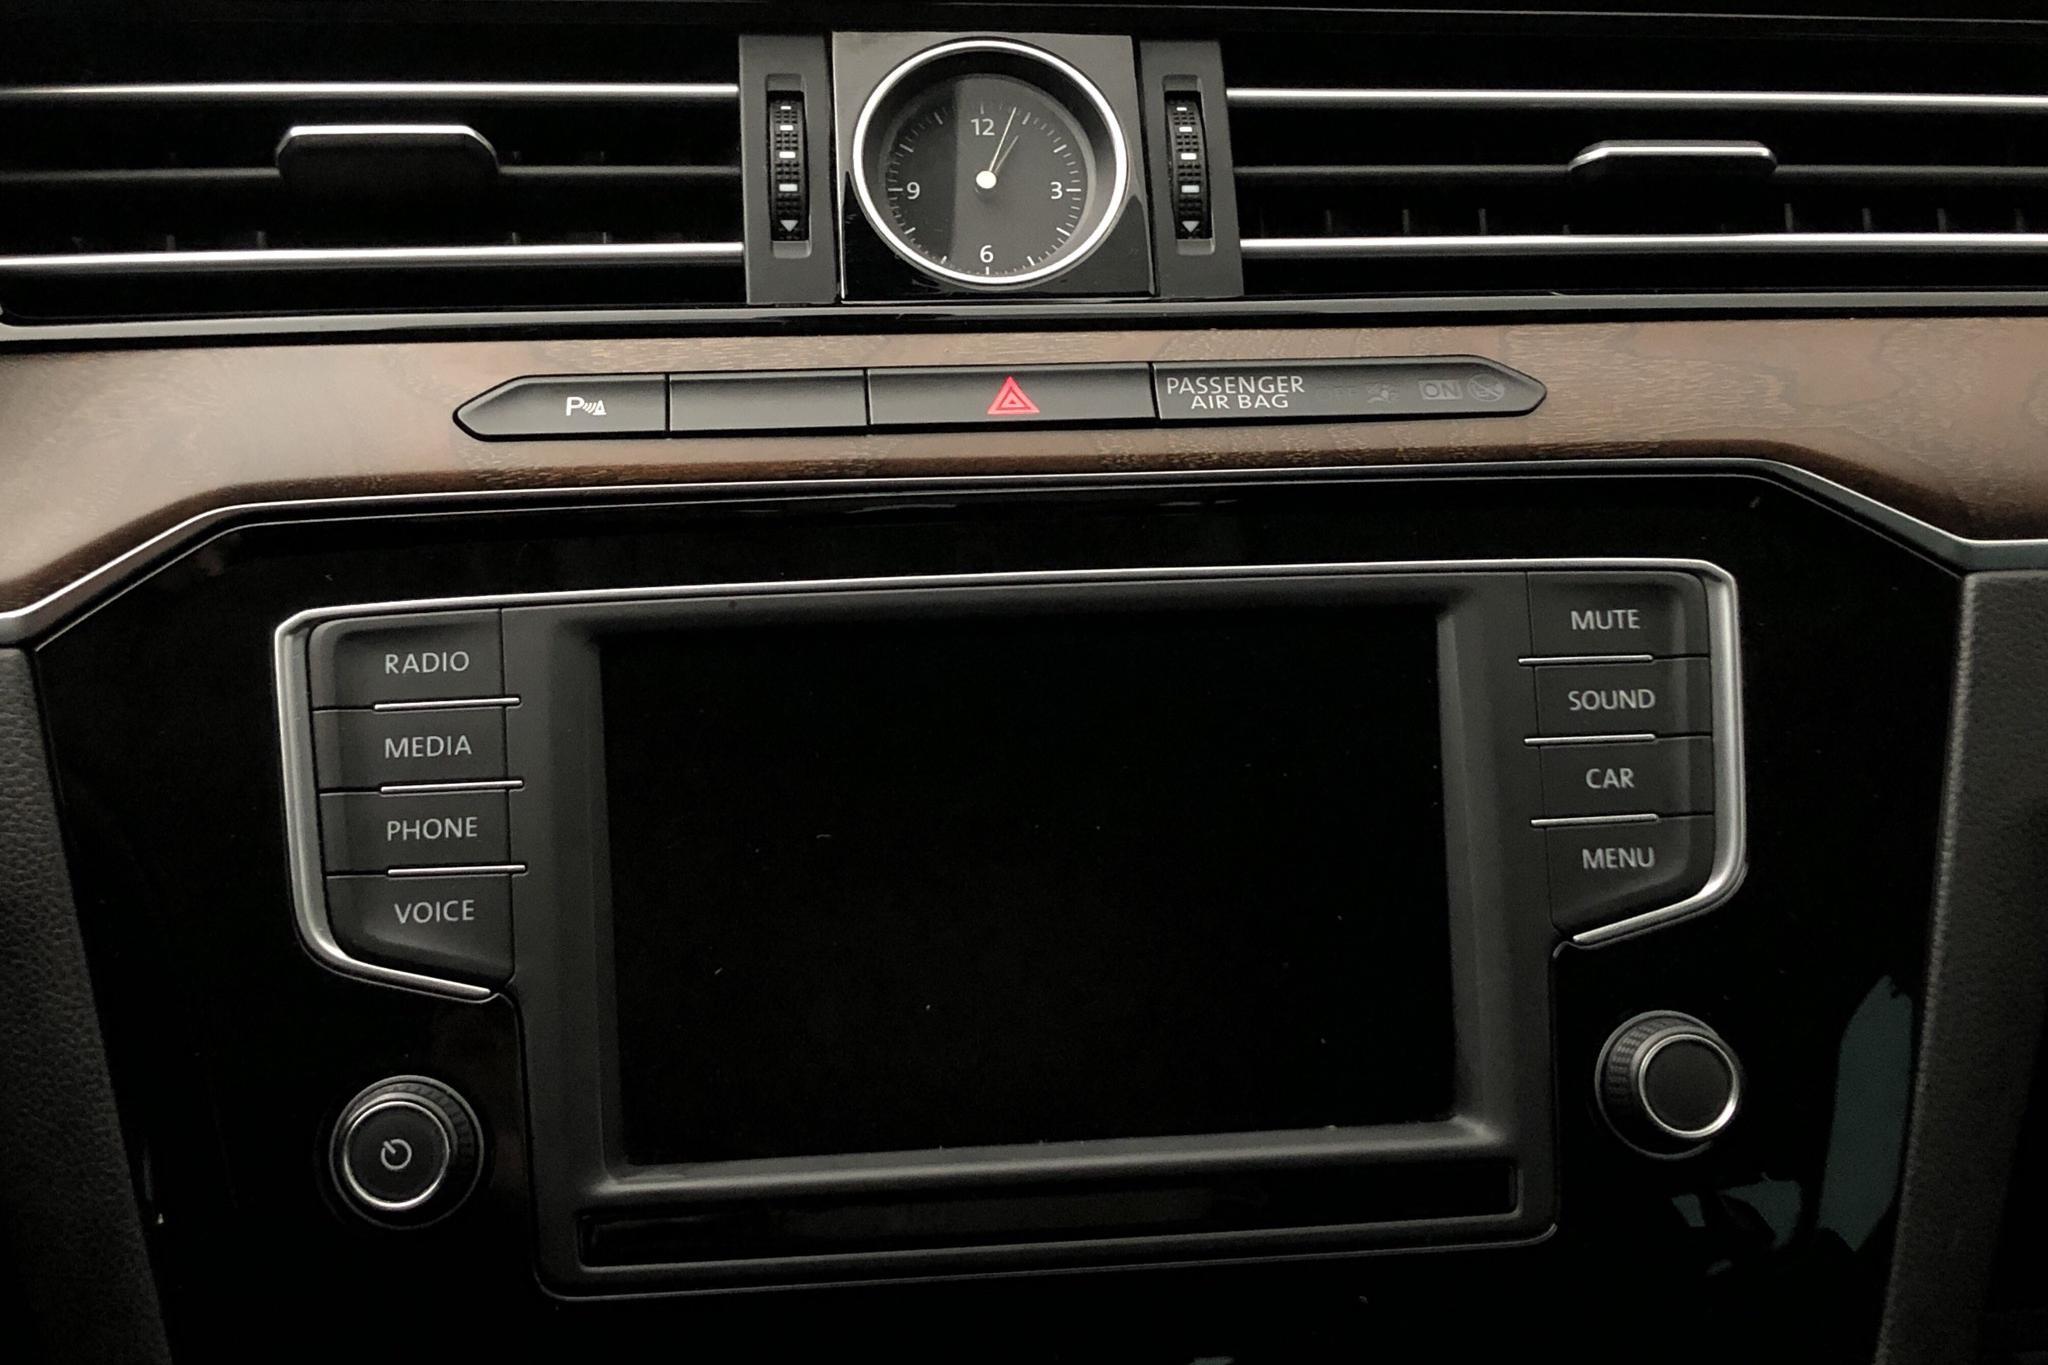 VW Passat 2.0 TDI Sportscombi (190hk) - 136 140 km - Automatic - black - 2016